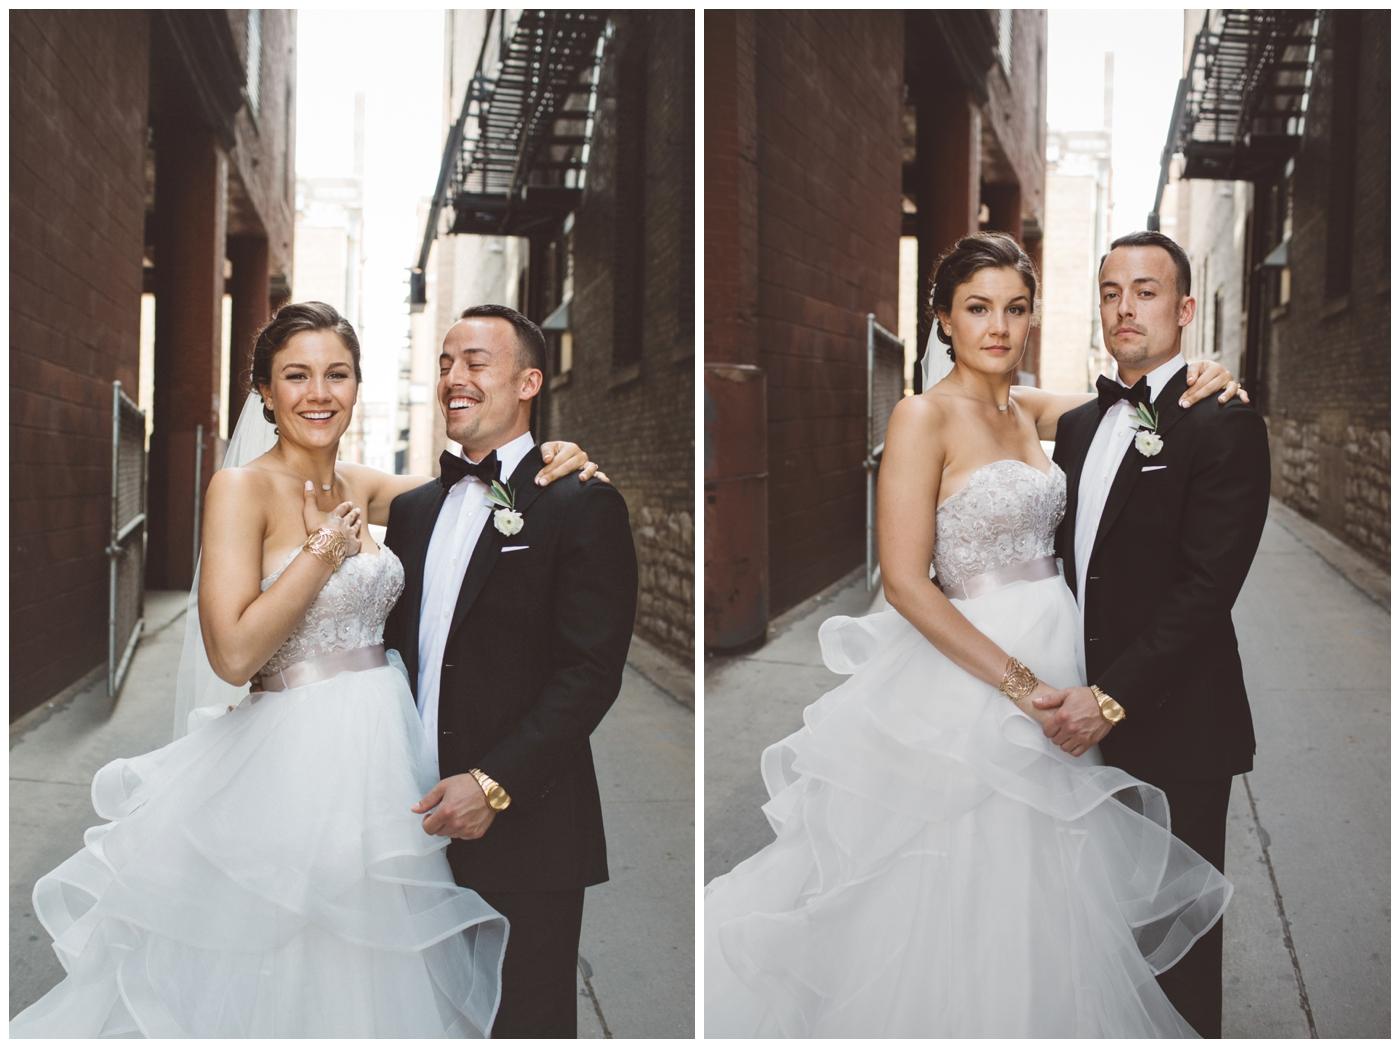 indianapolis_wedding_photographer-2.jpg